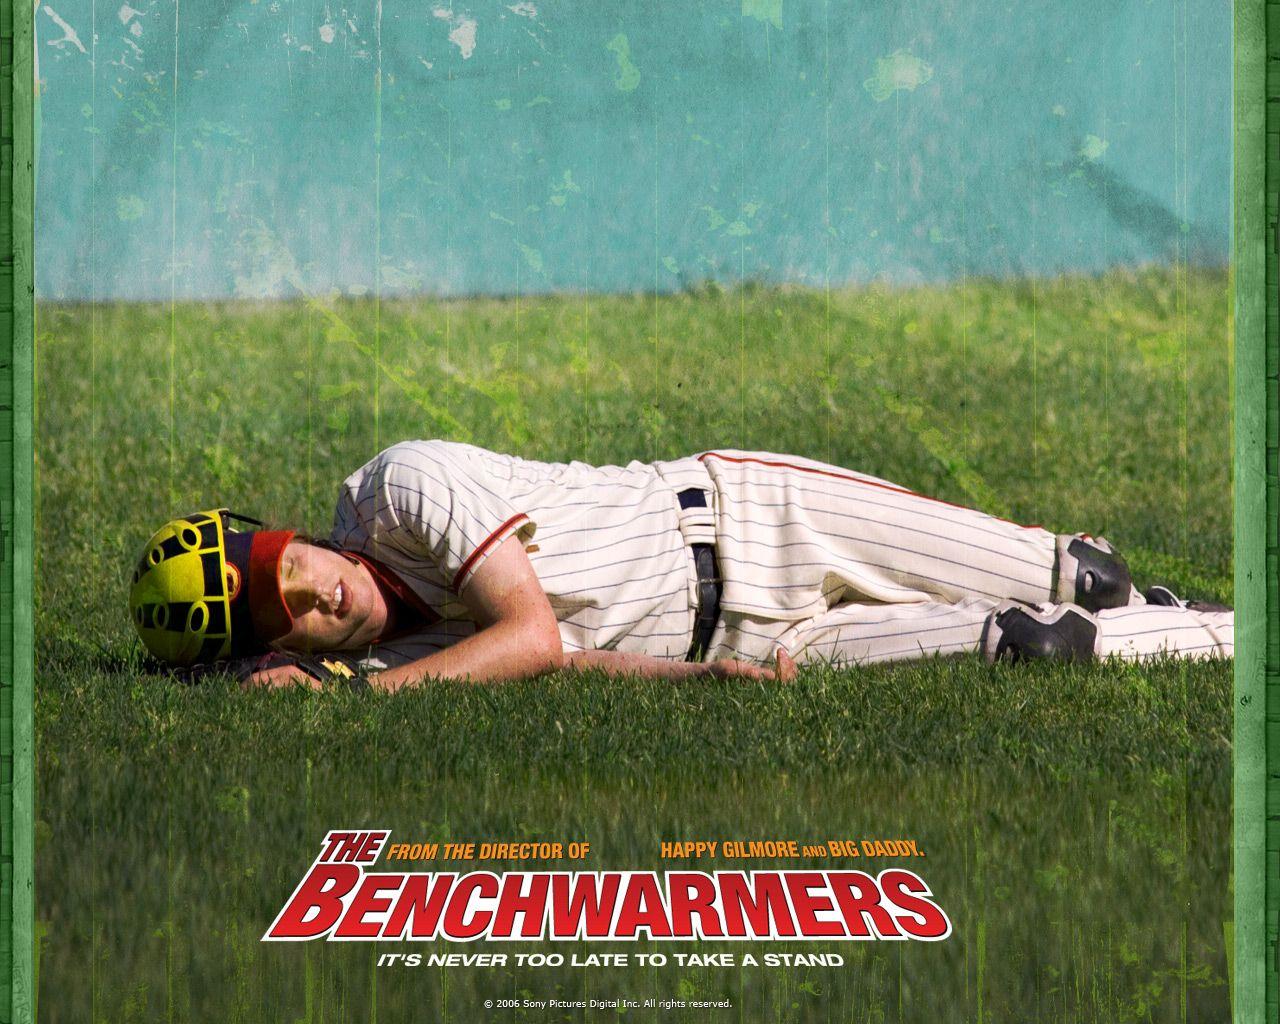 Howie Sunblock Benchwarmers